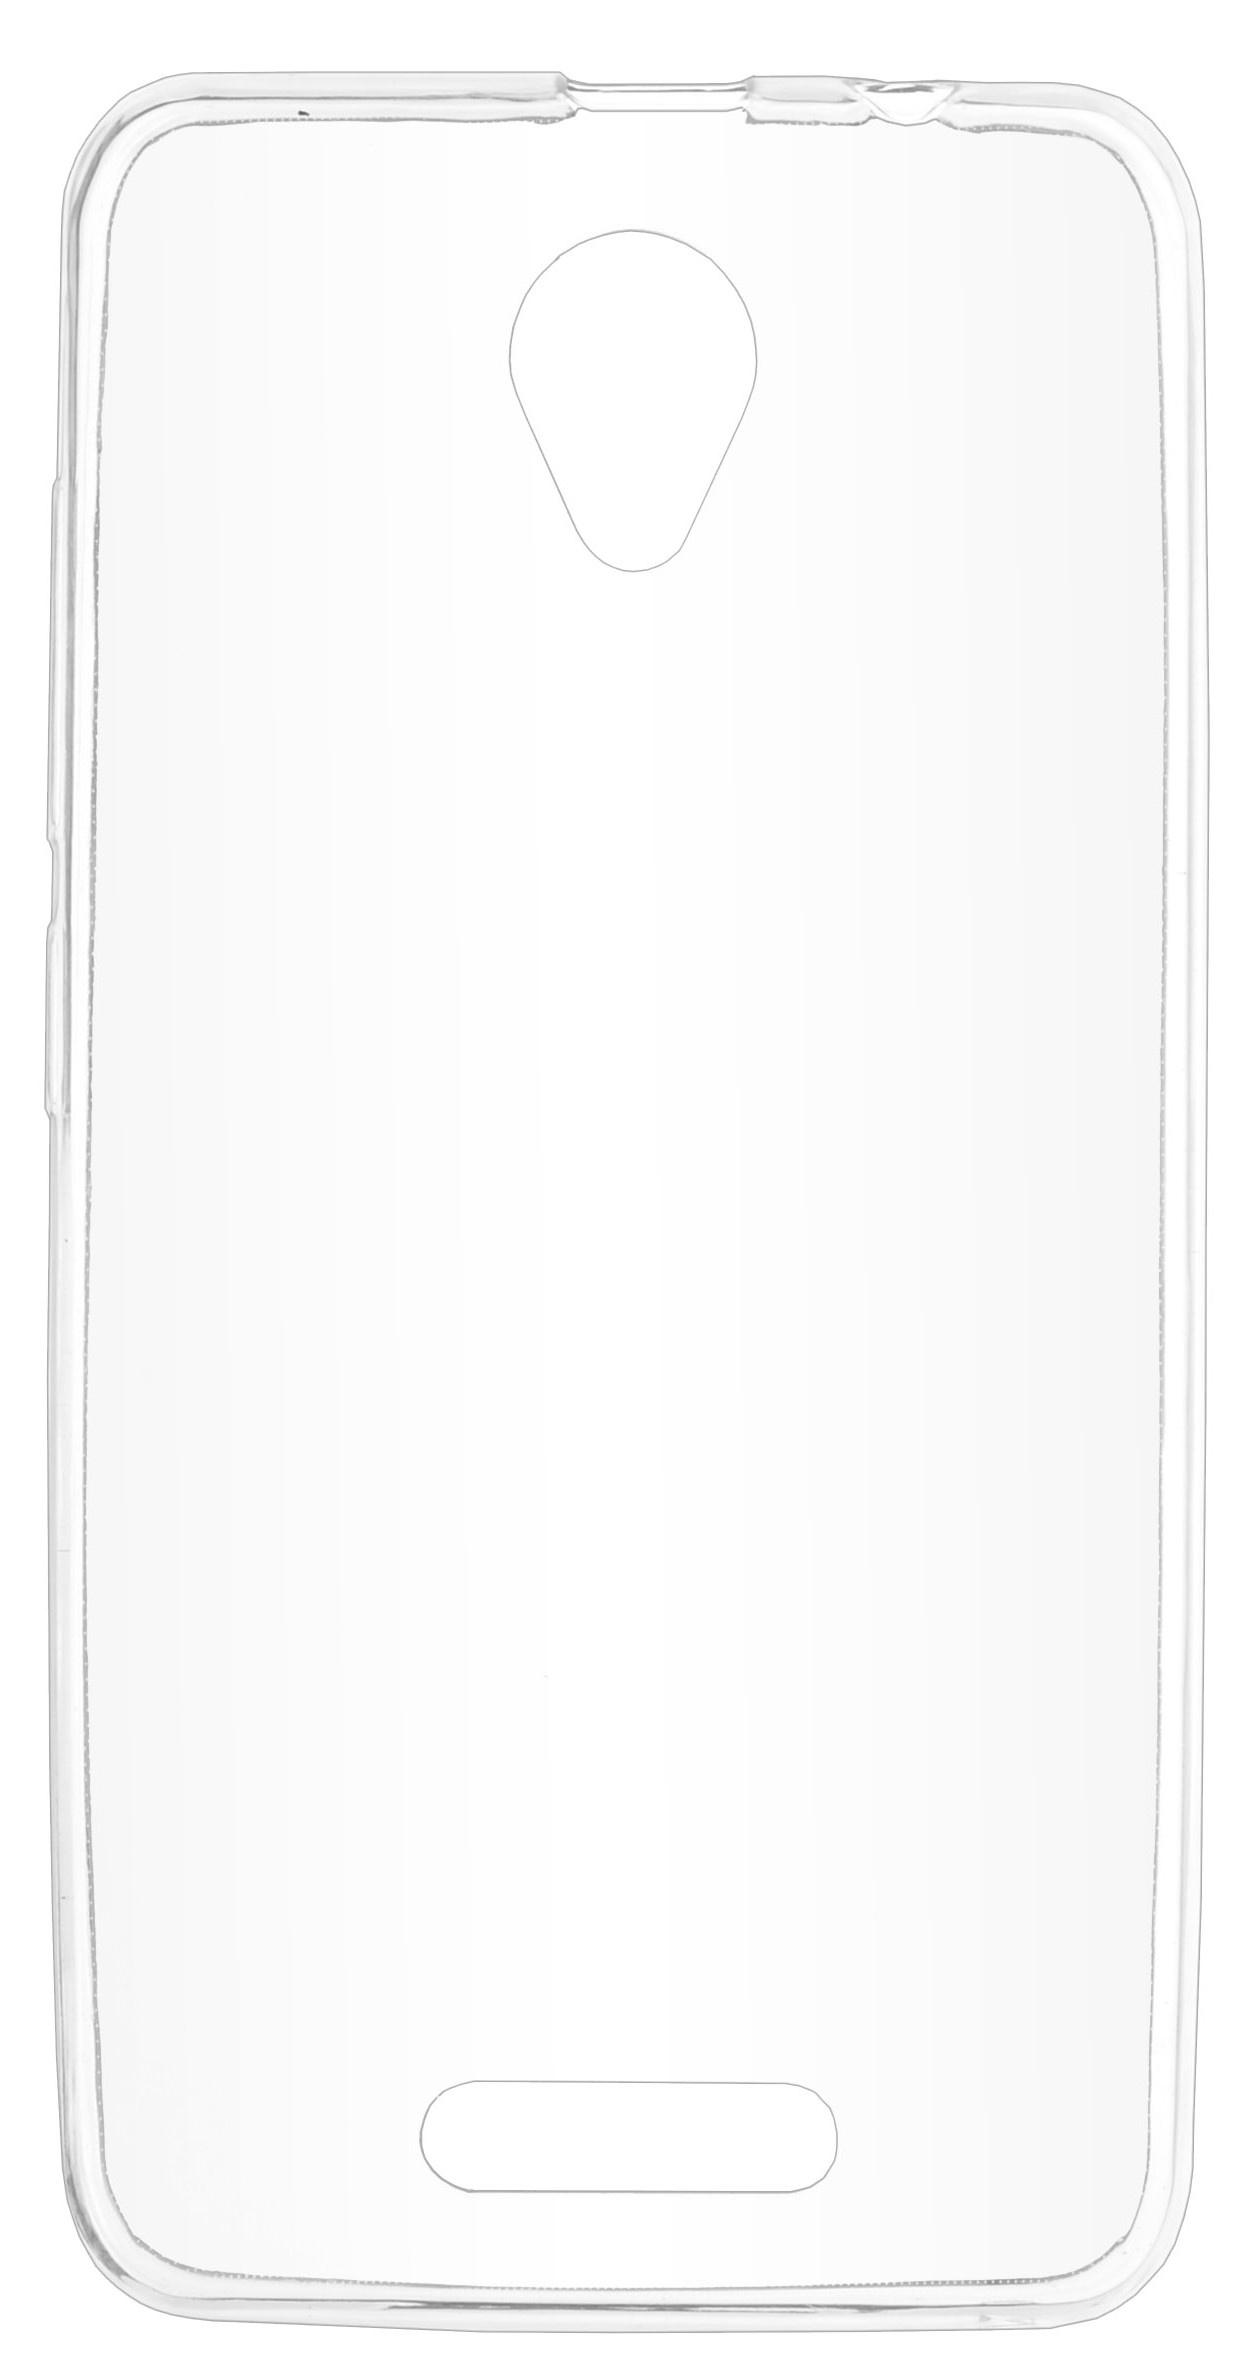 цена на Чехол для сотового телефона skinBOX Slim Silicone, 4660041409499, прозрачный